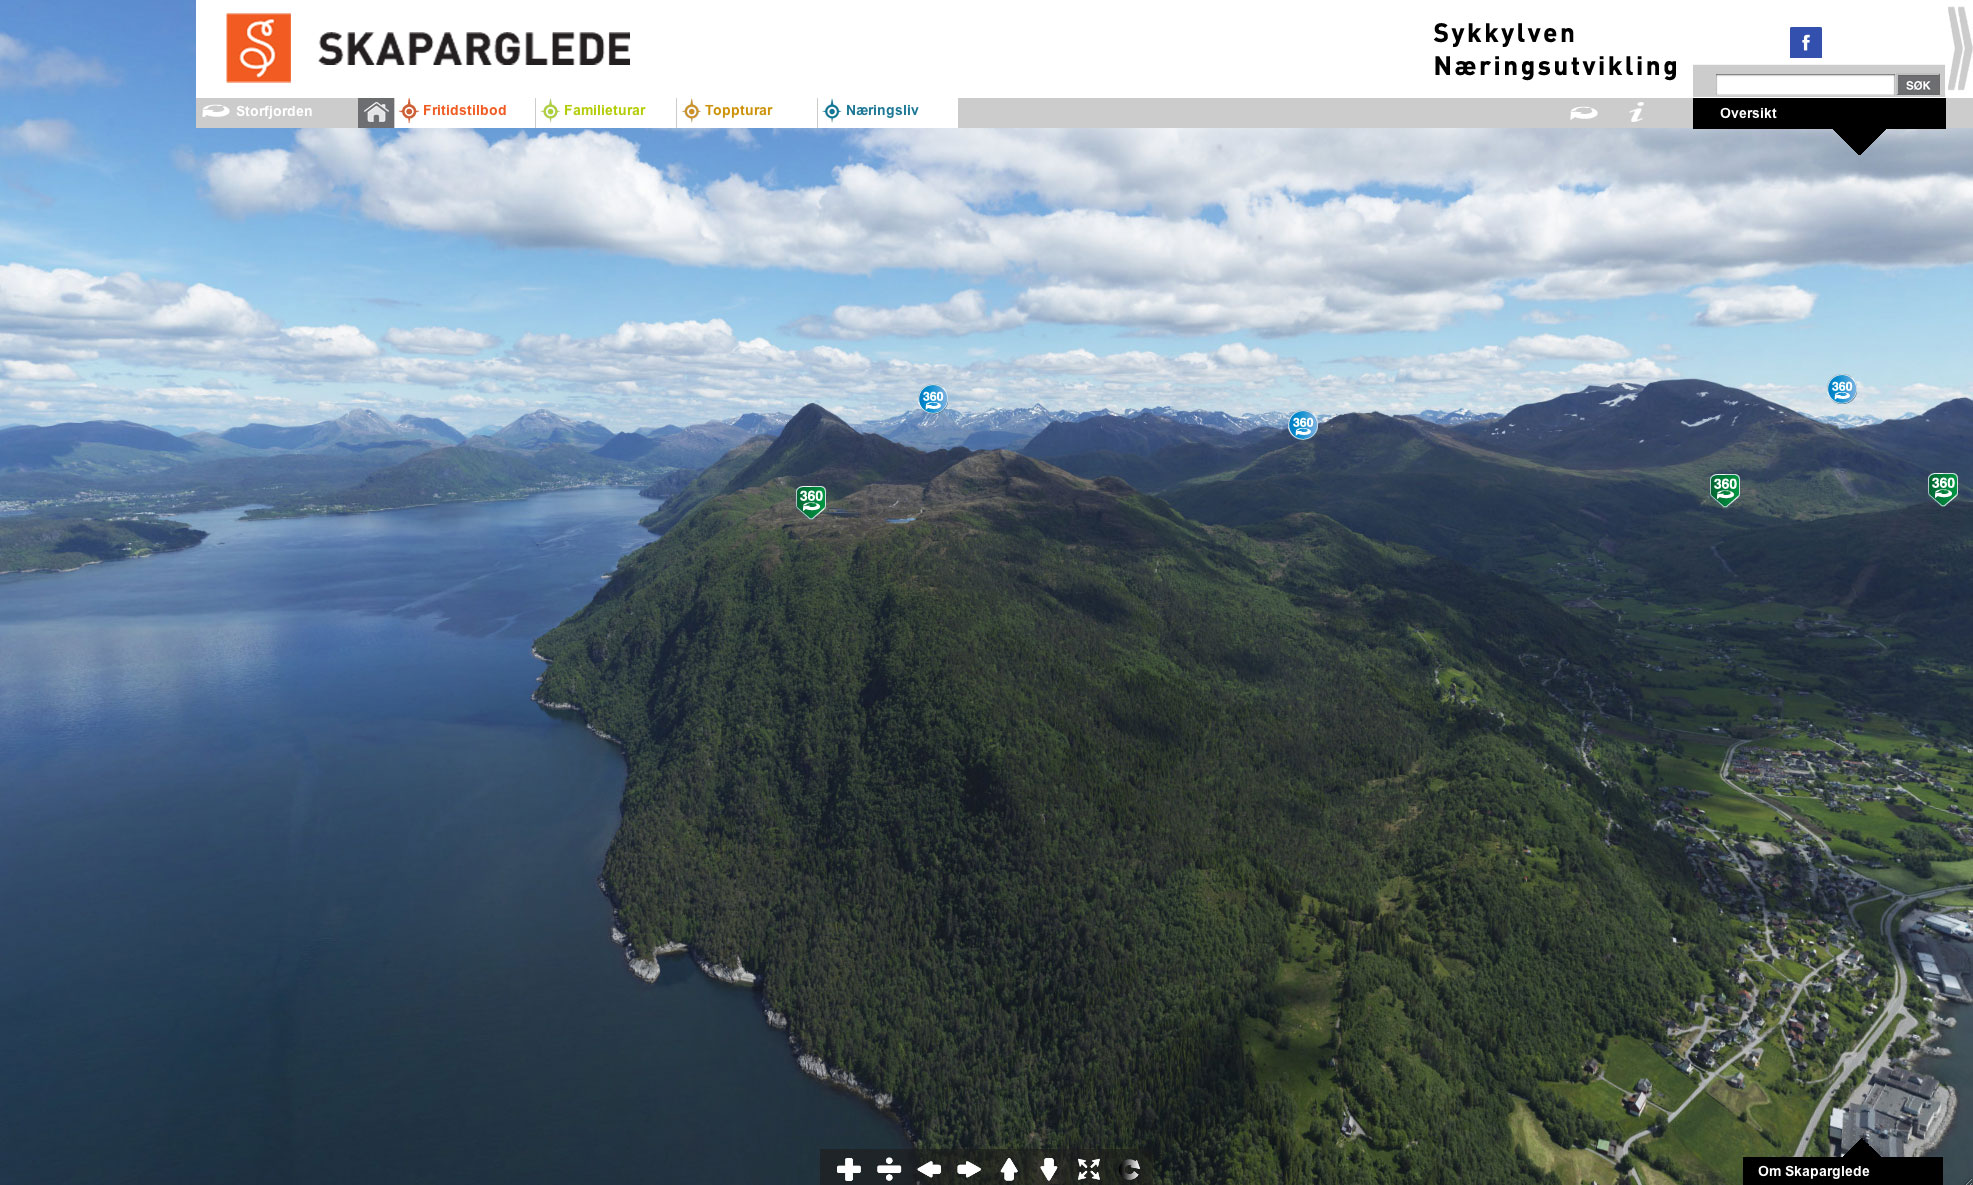 Sjå unike bilder på skaparglede.no (Foto: Arild Solberg)